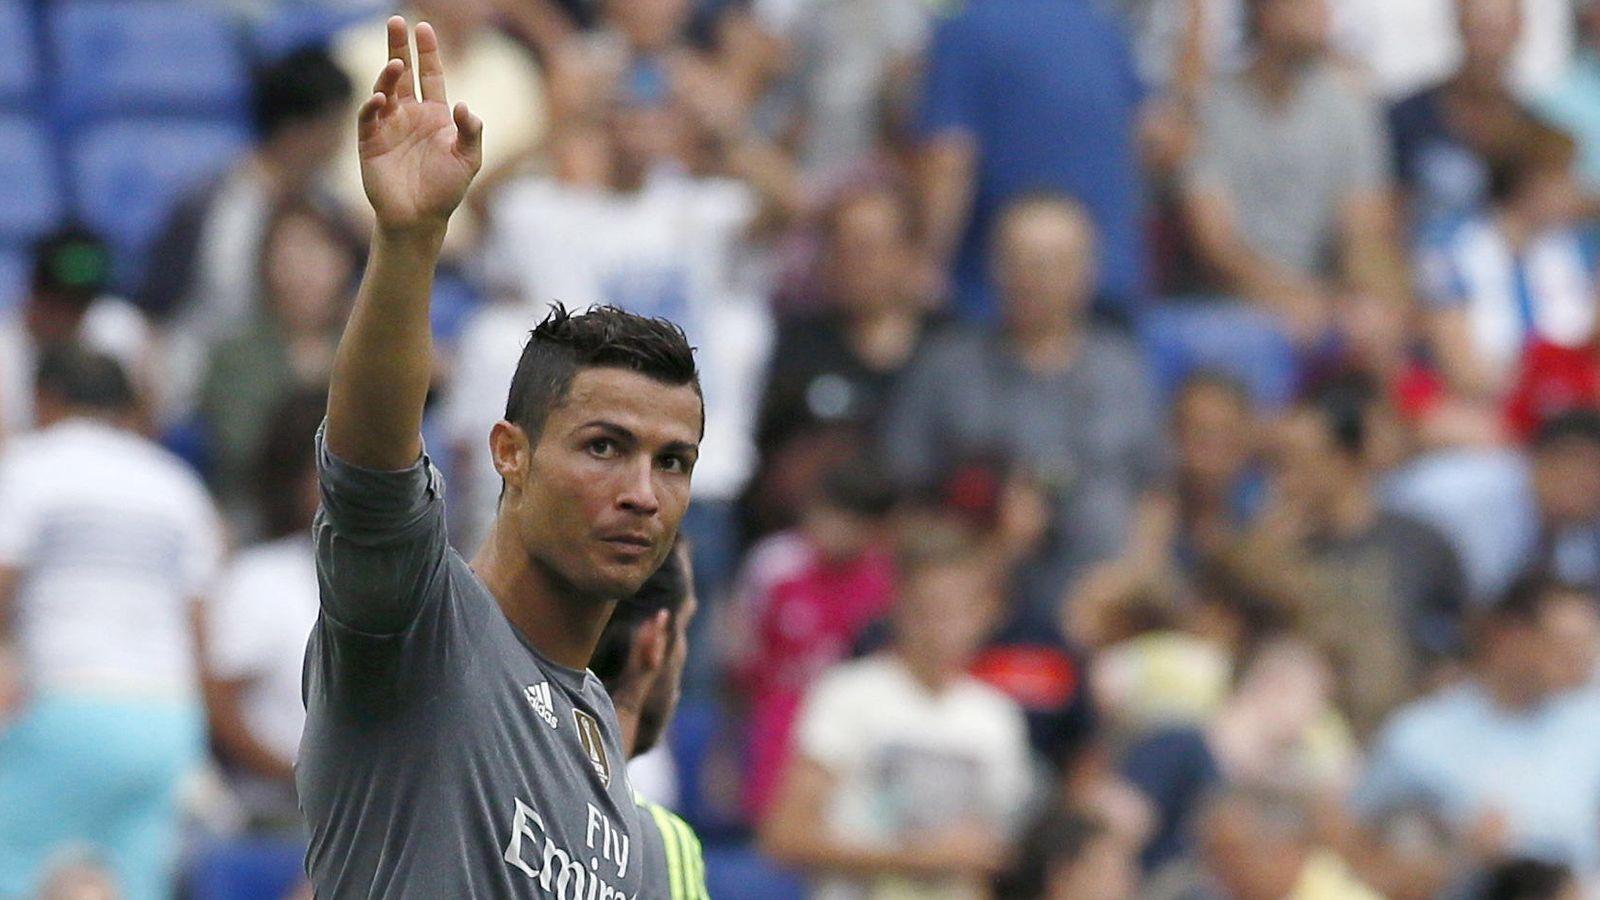 Foto: Cristiano Ronaldo celebra uno de sus tantos de la tarde del sábado.